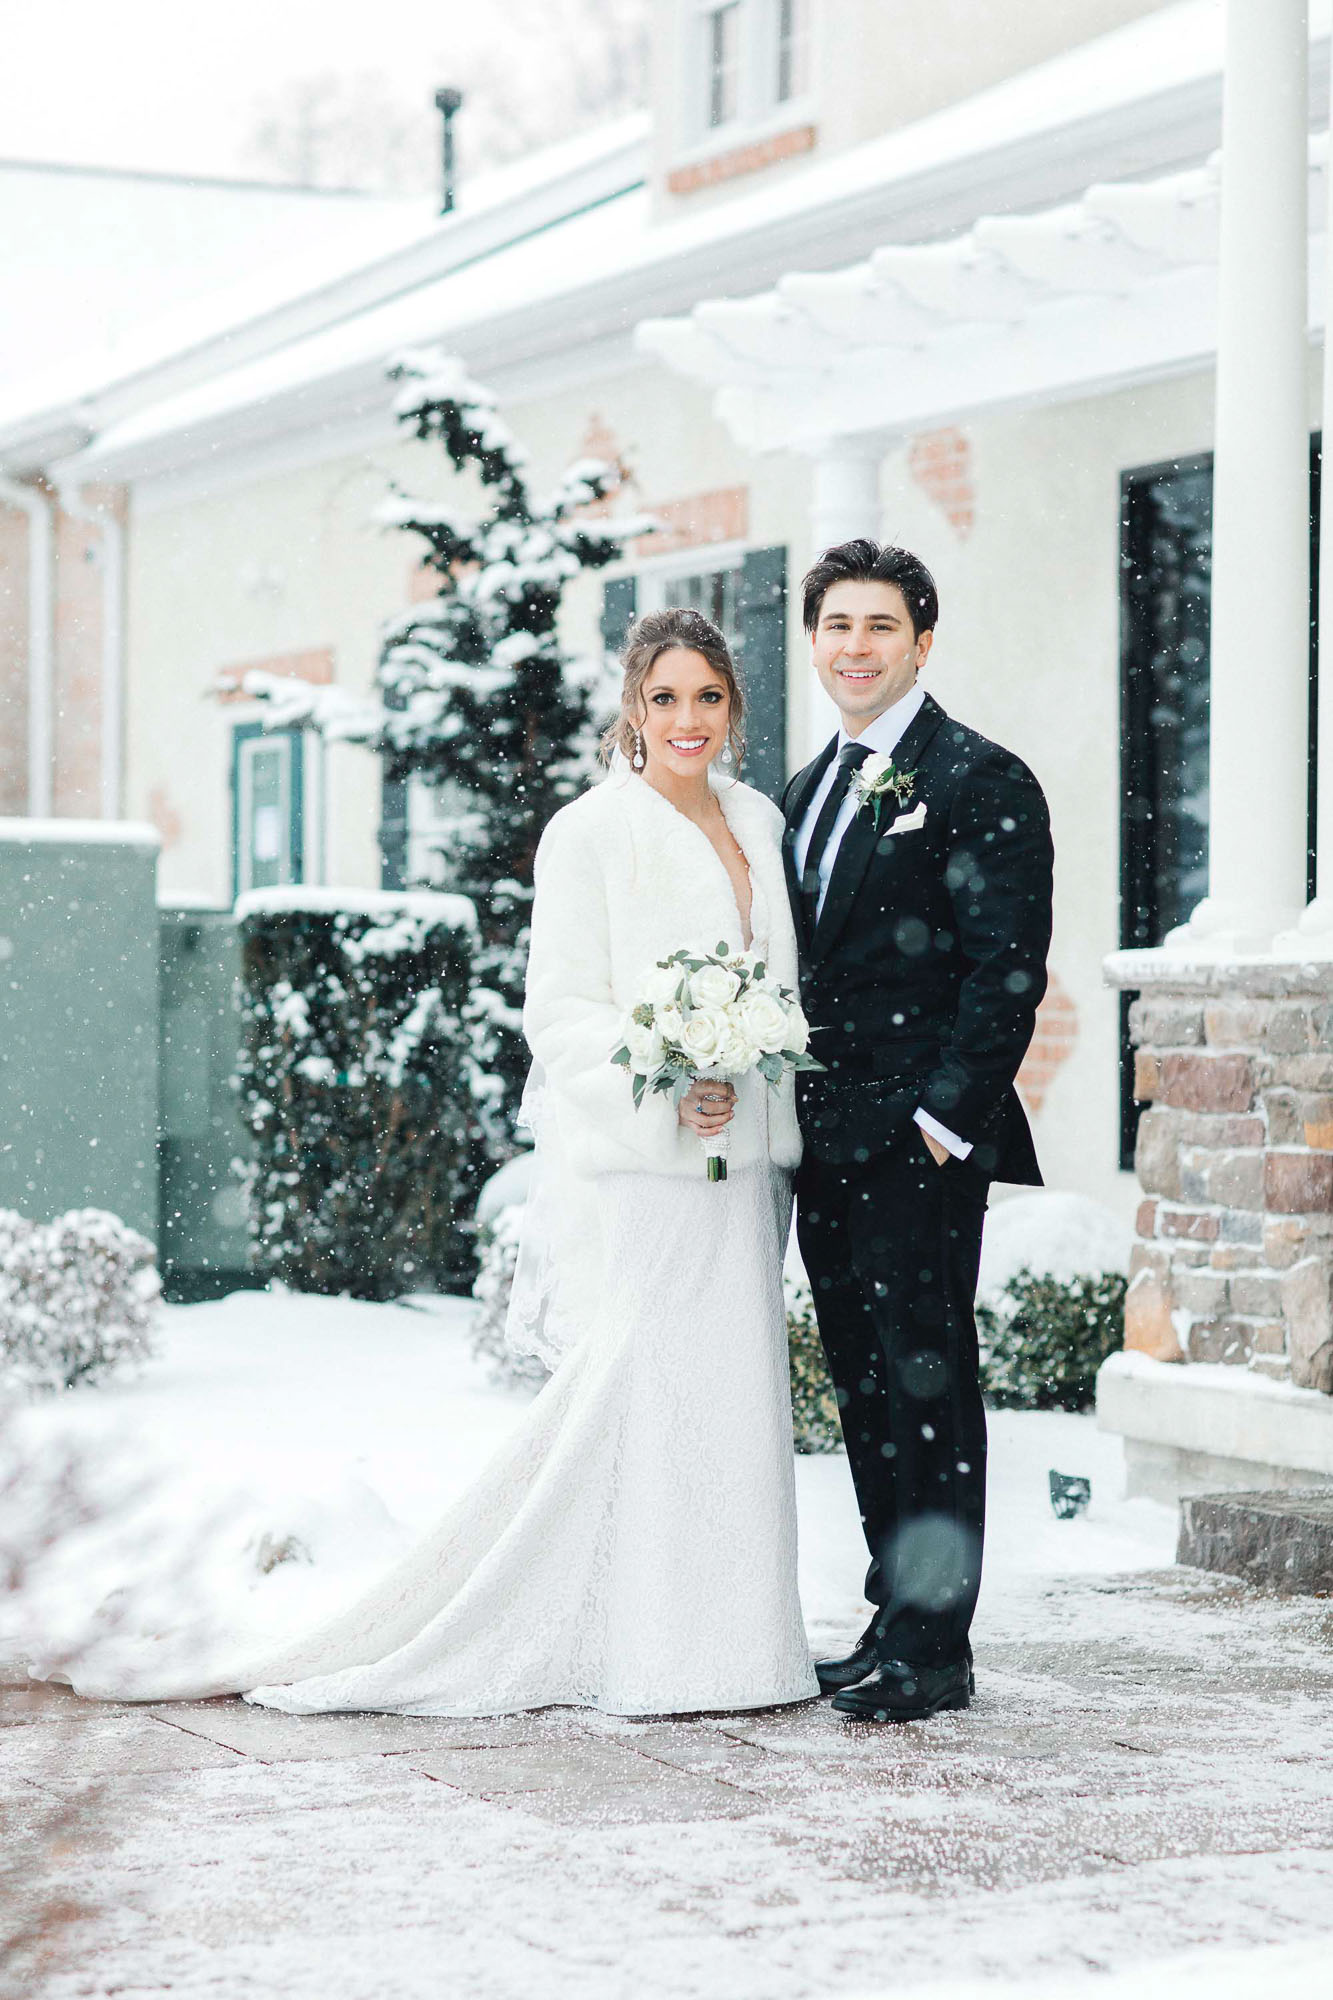 snowy-sand-springs-country-club-drums-pa-christmas-wedding-24580.jpg